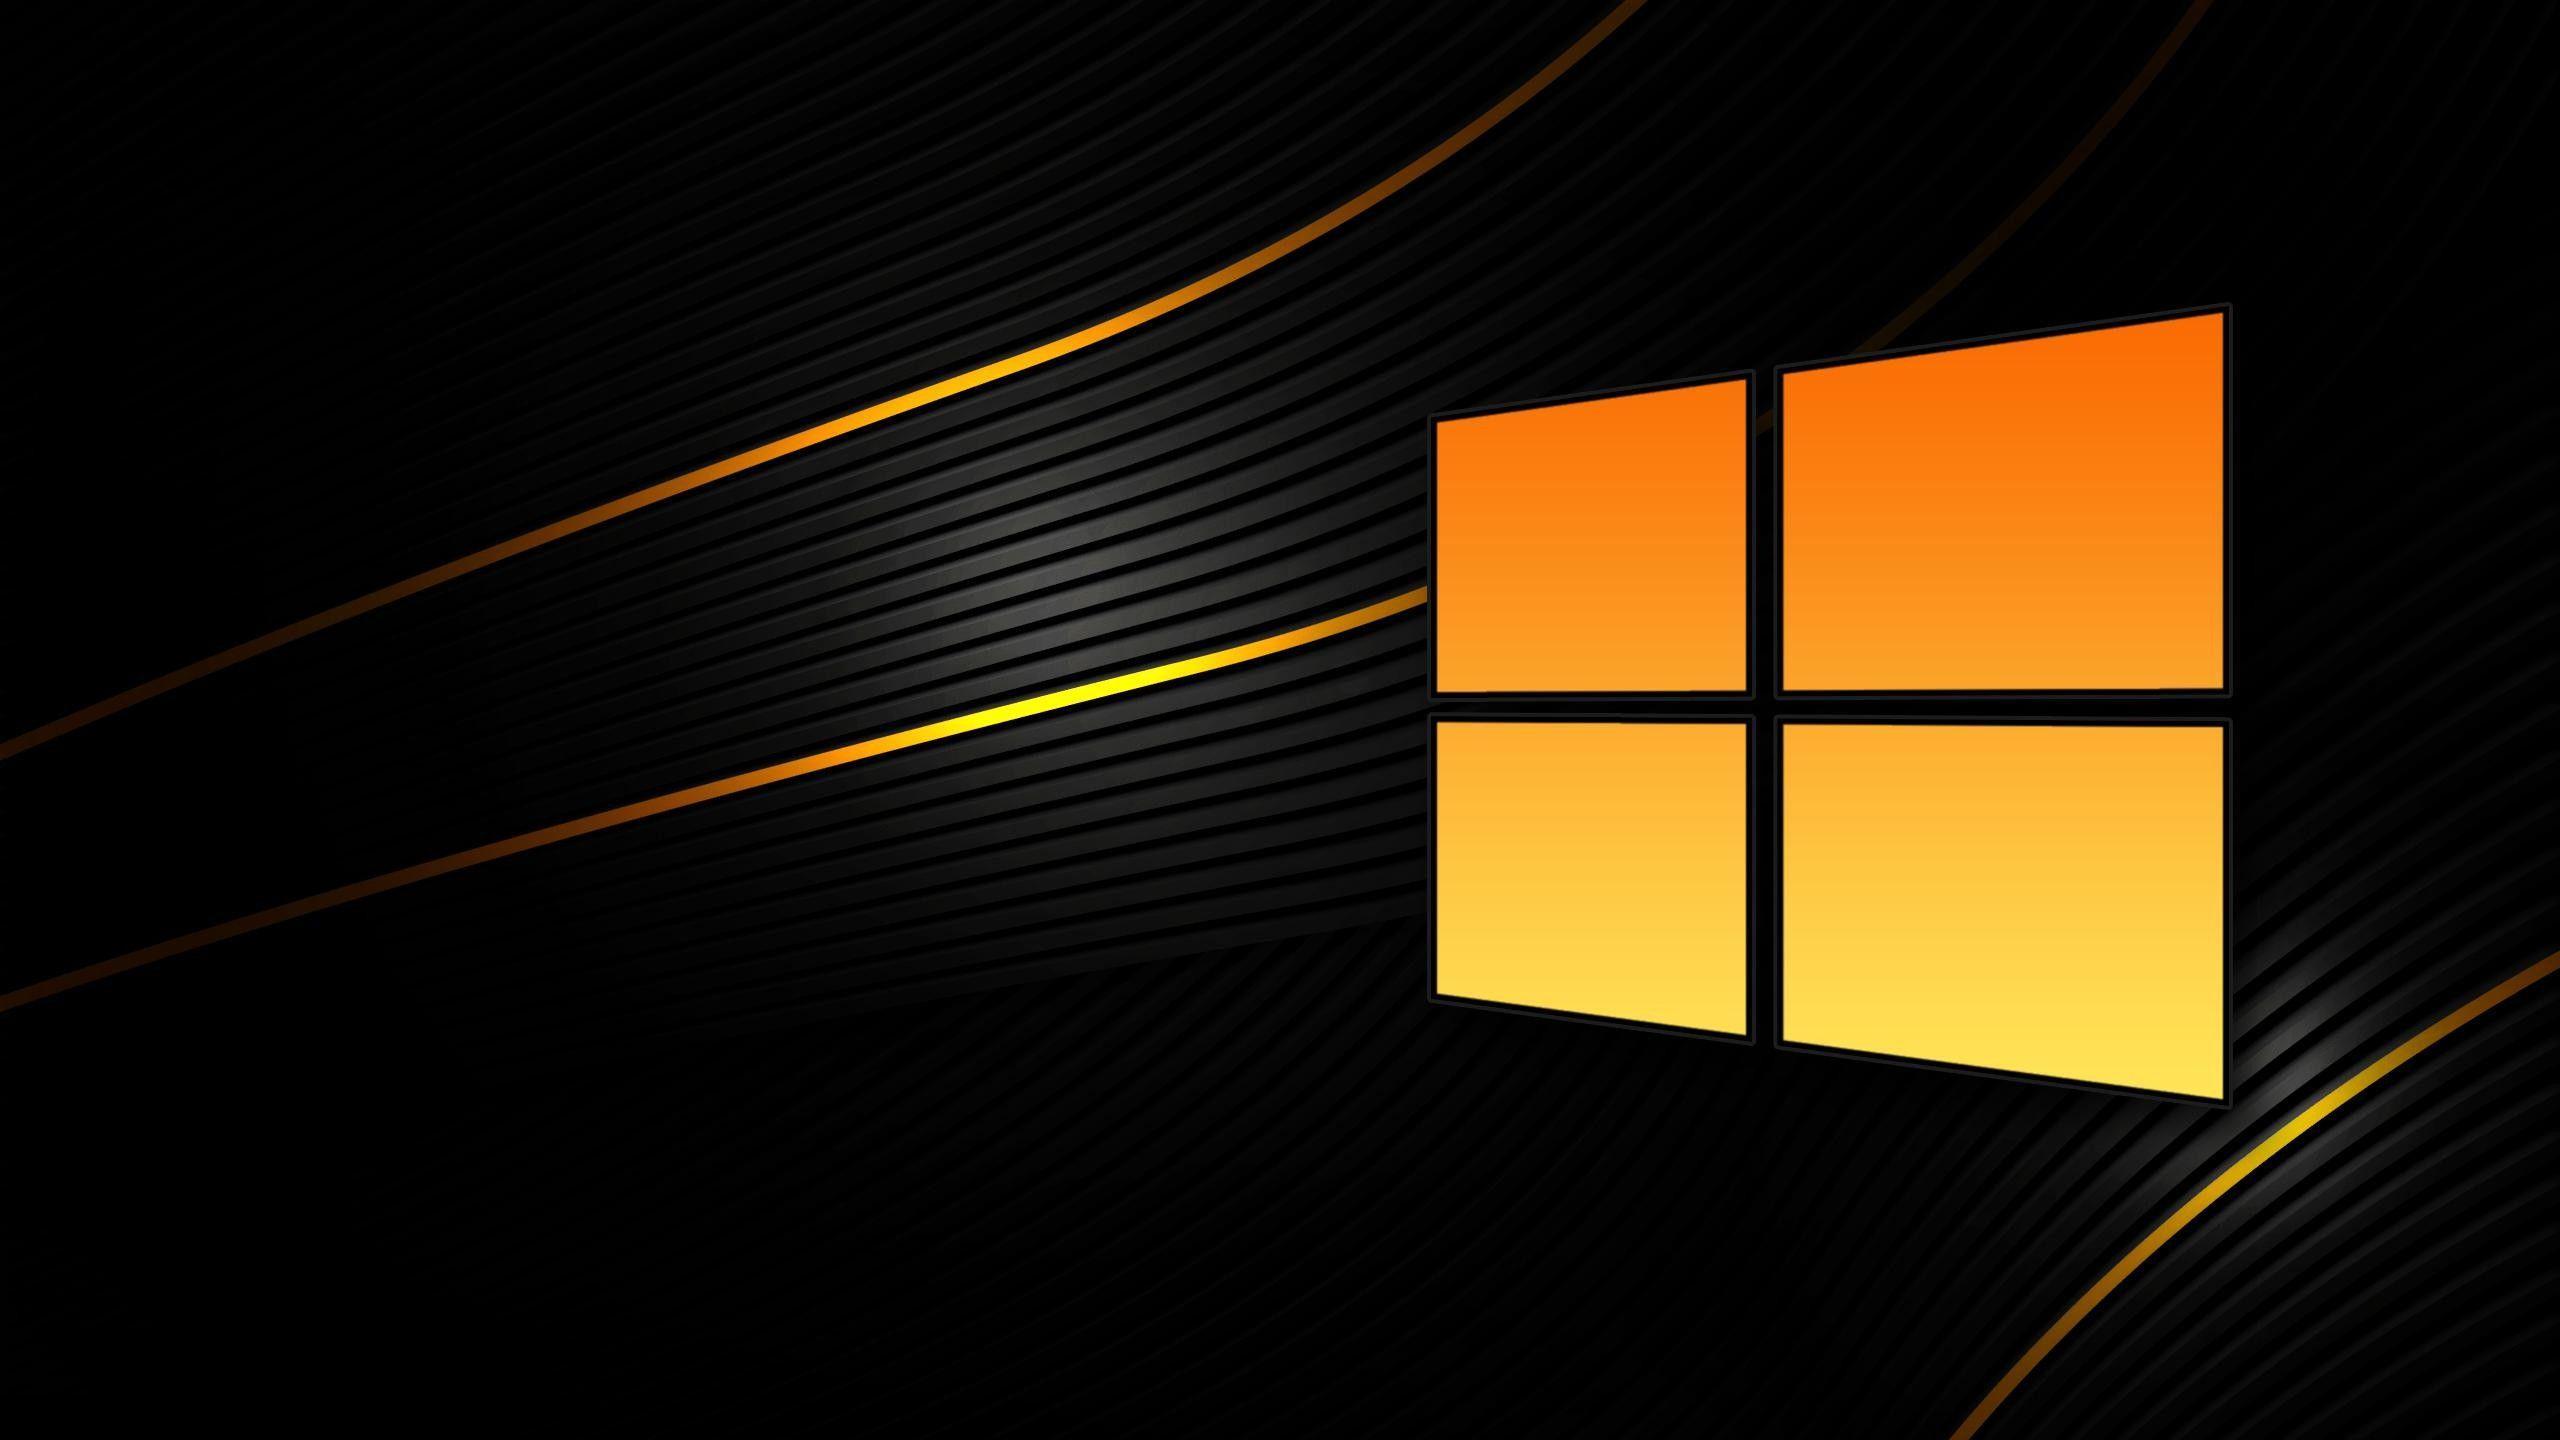 Cool Wallpaper Windows 10